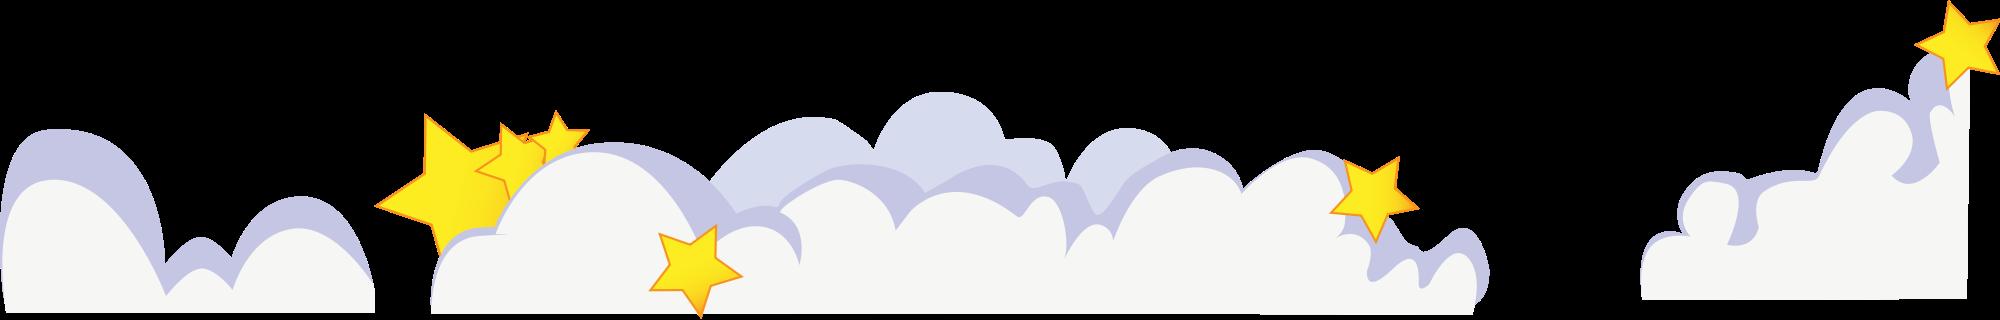 Cloud border png. Clouds cartoon file cute